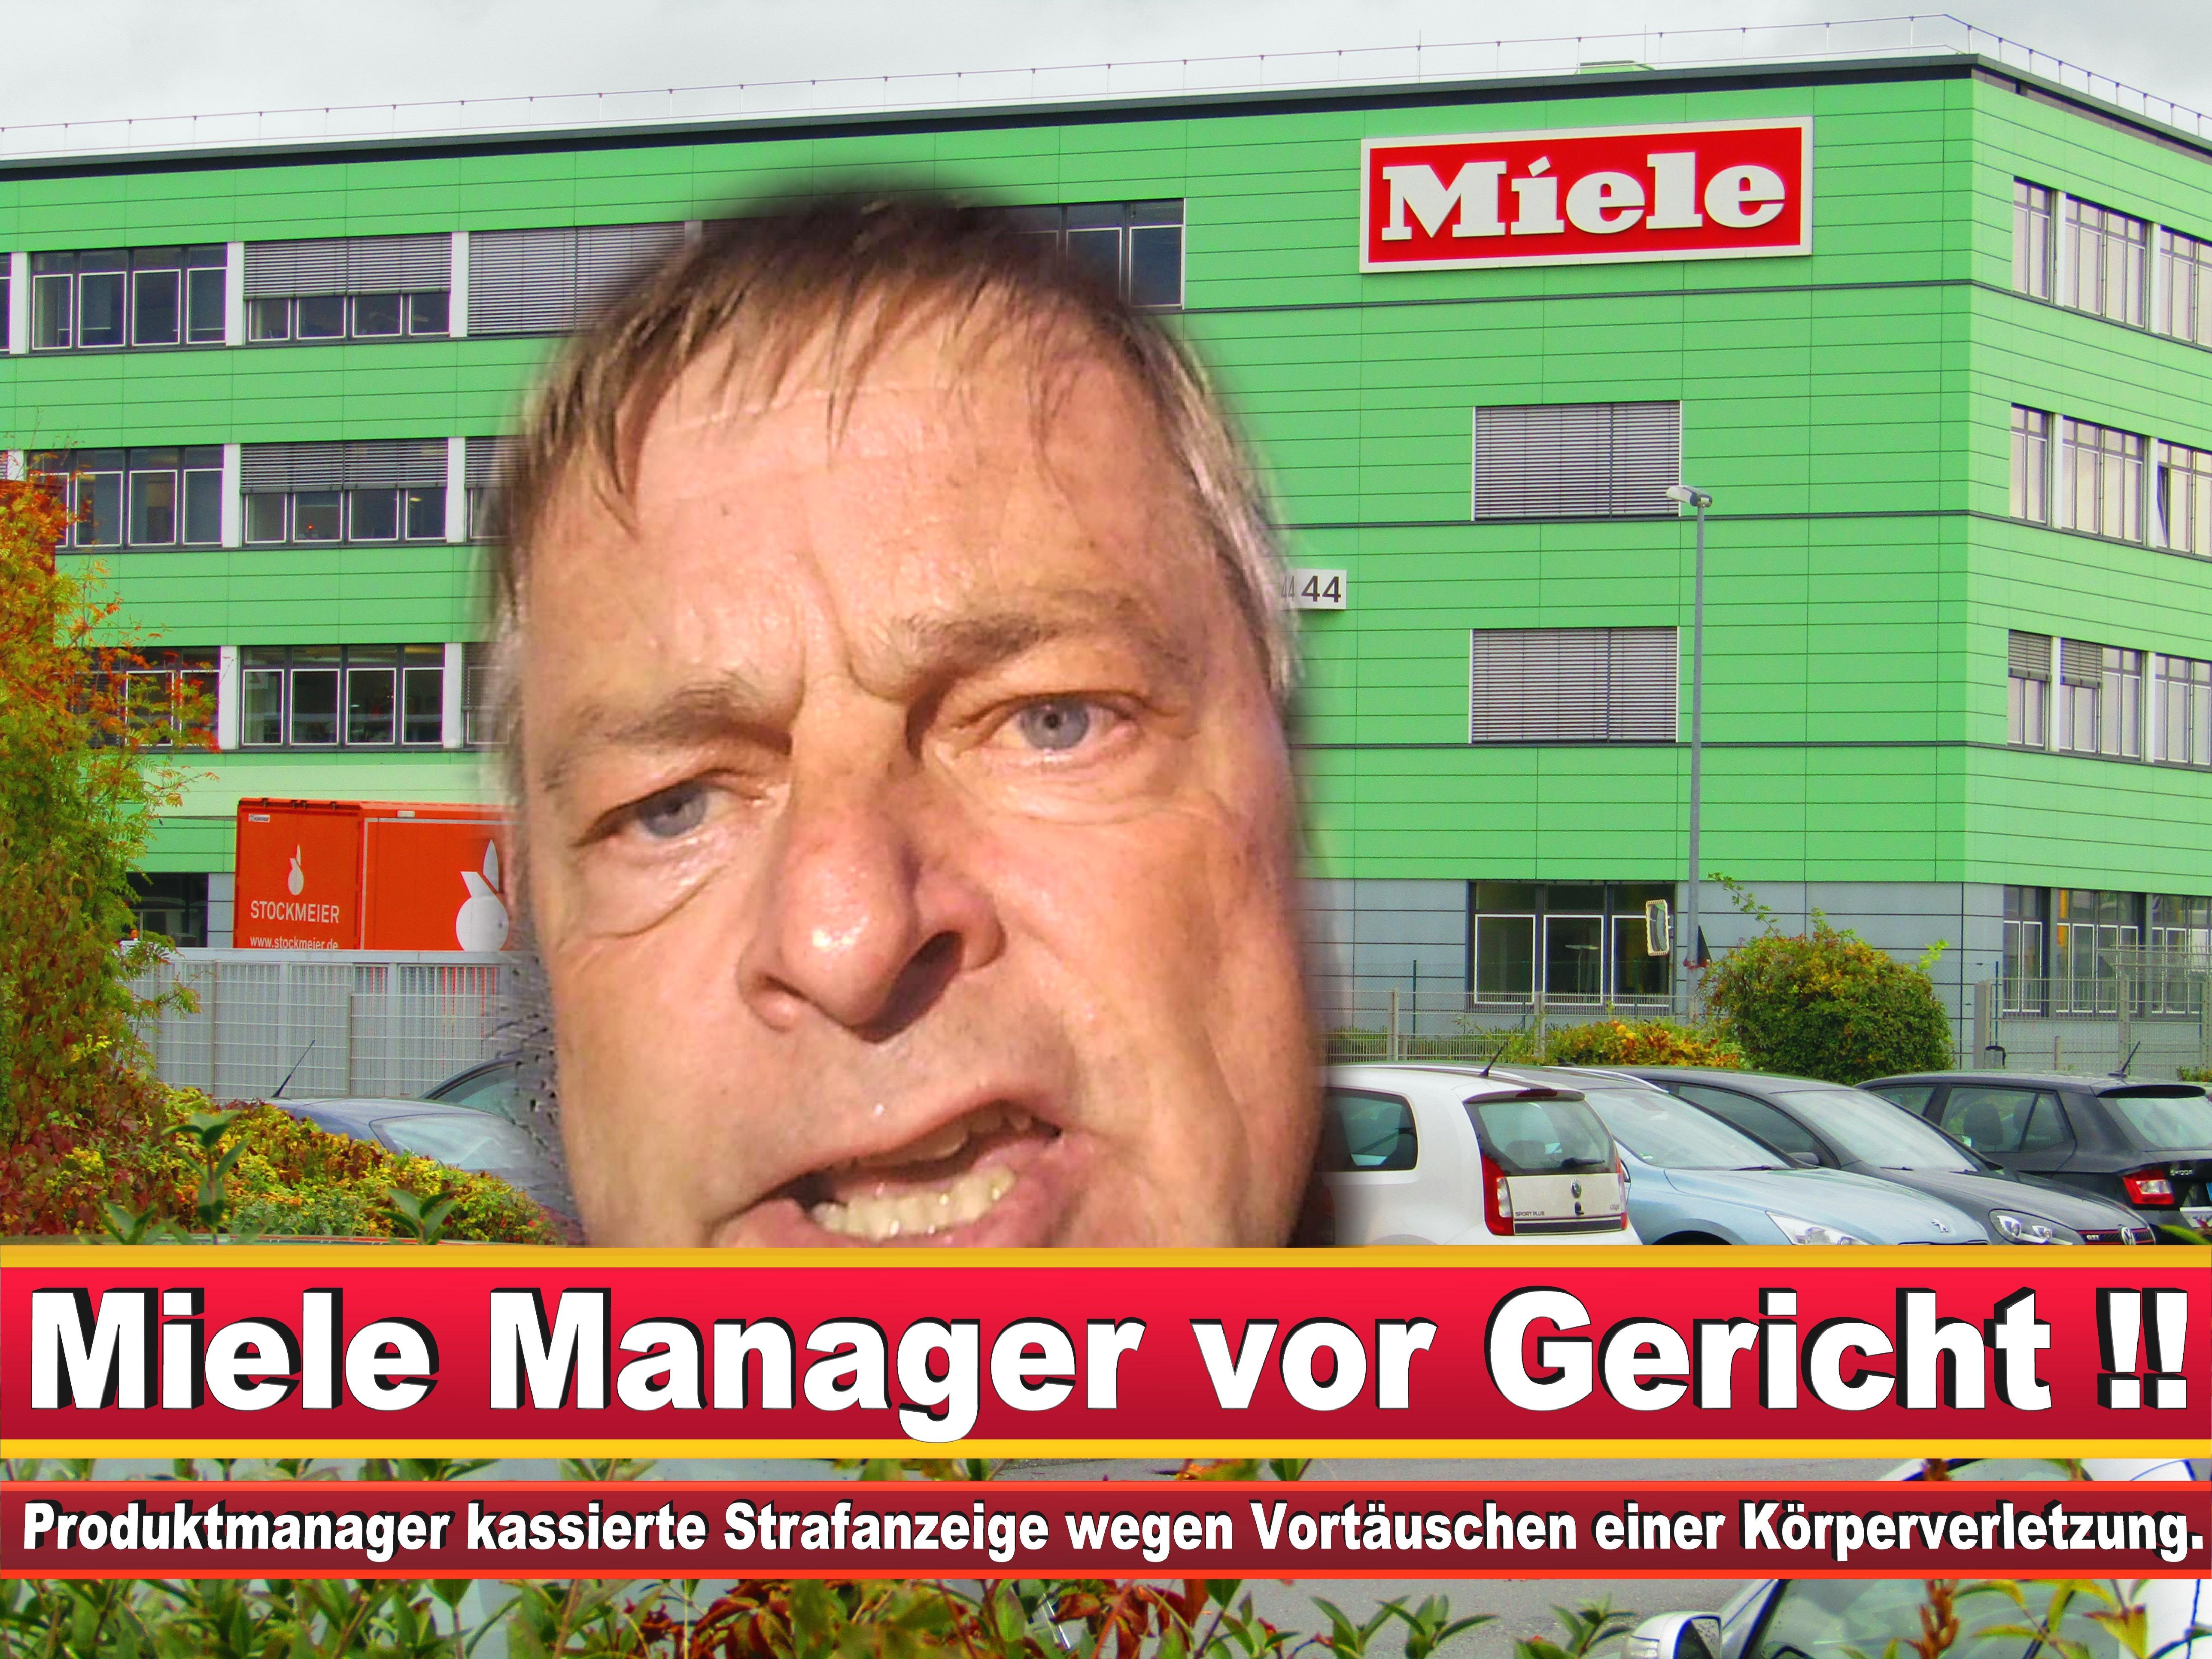 MIELE TROCKNER LÜFTER DEFEKT